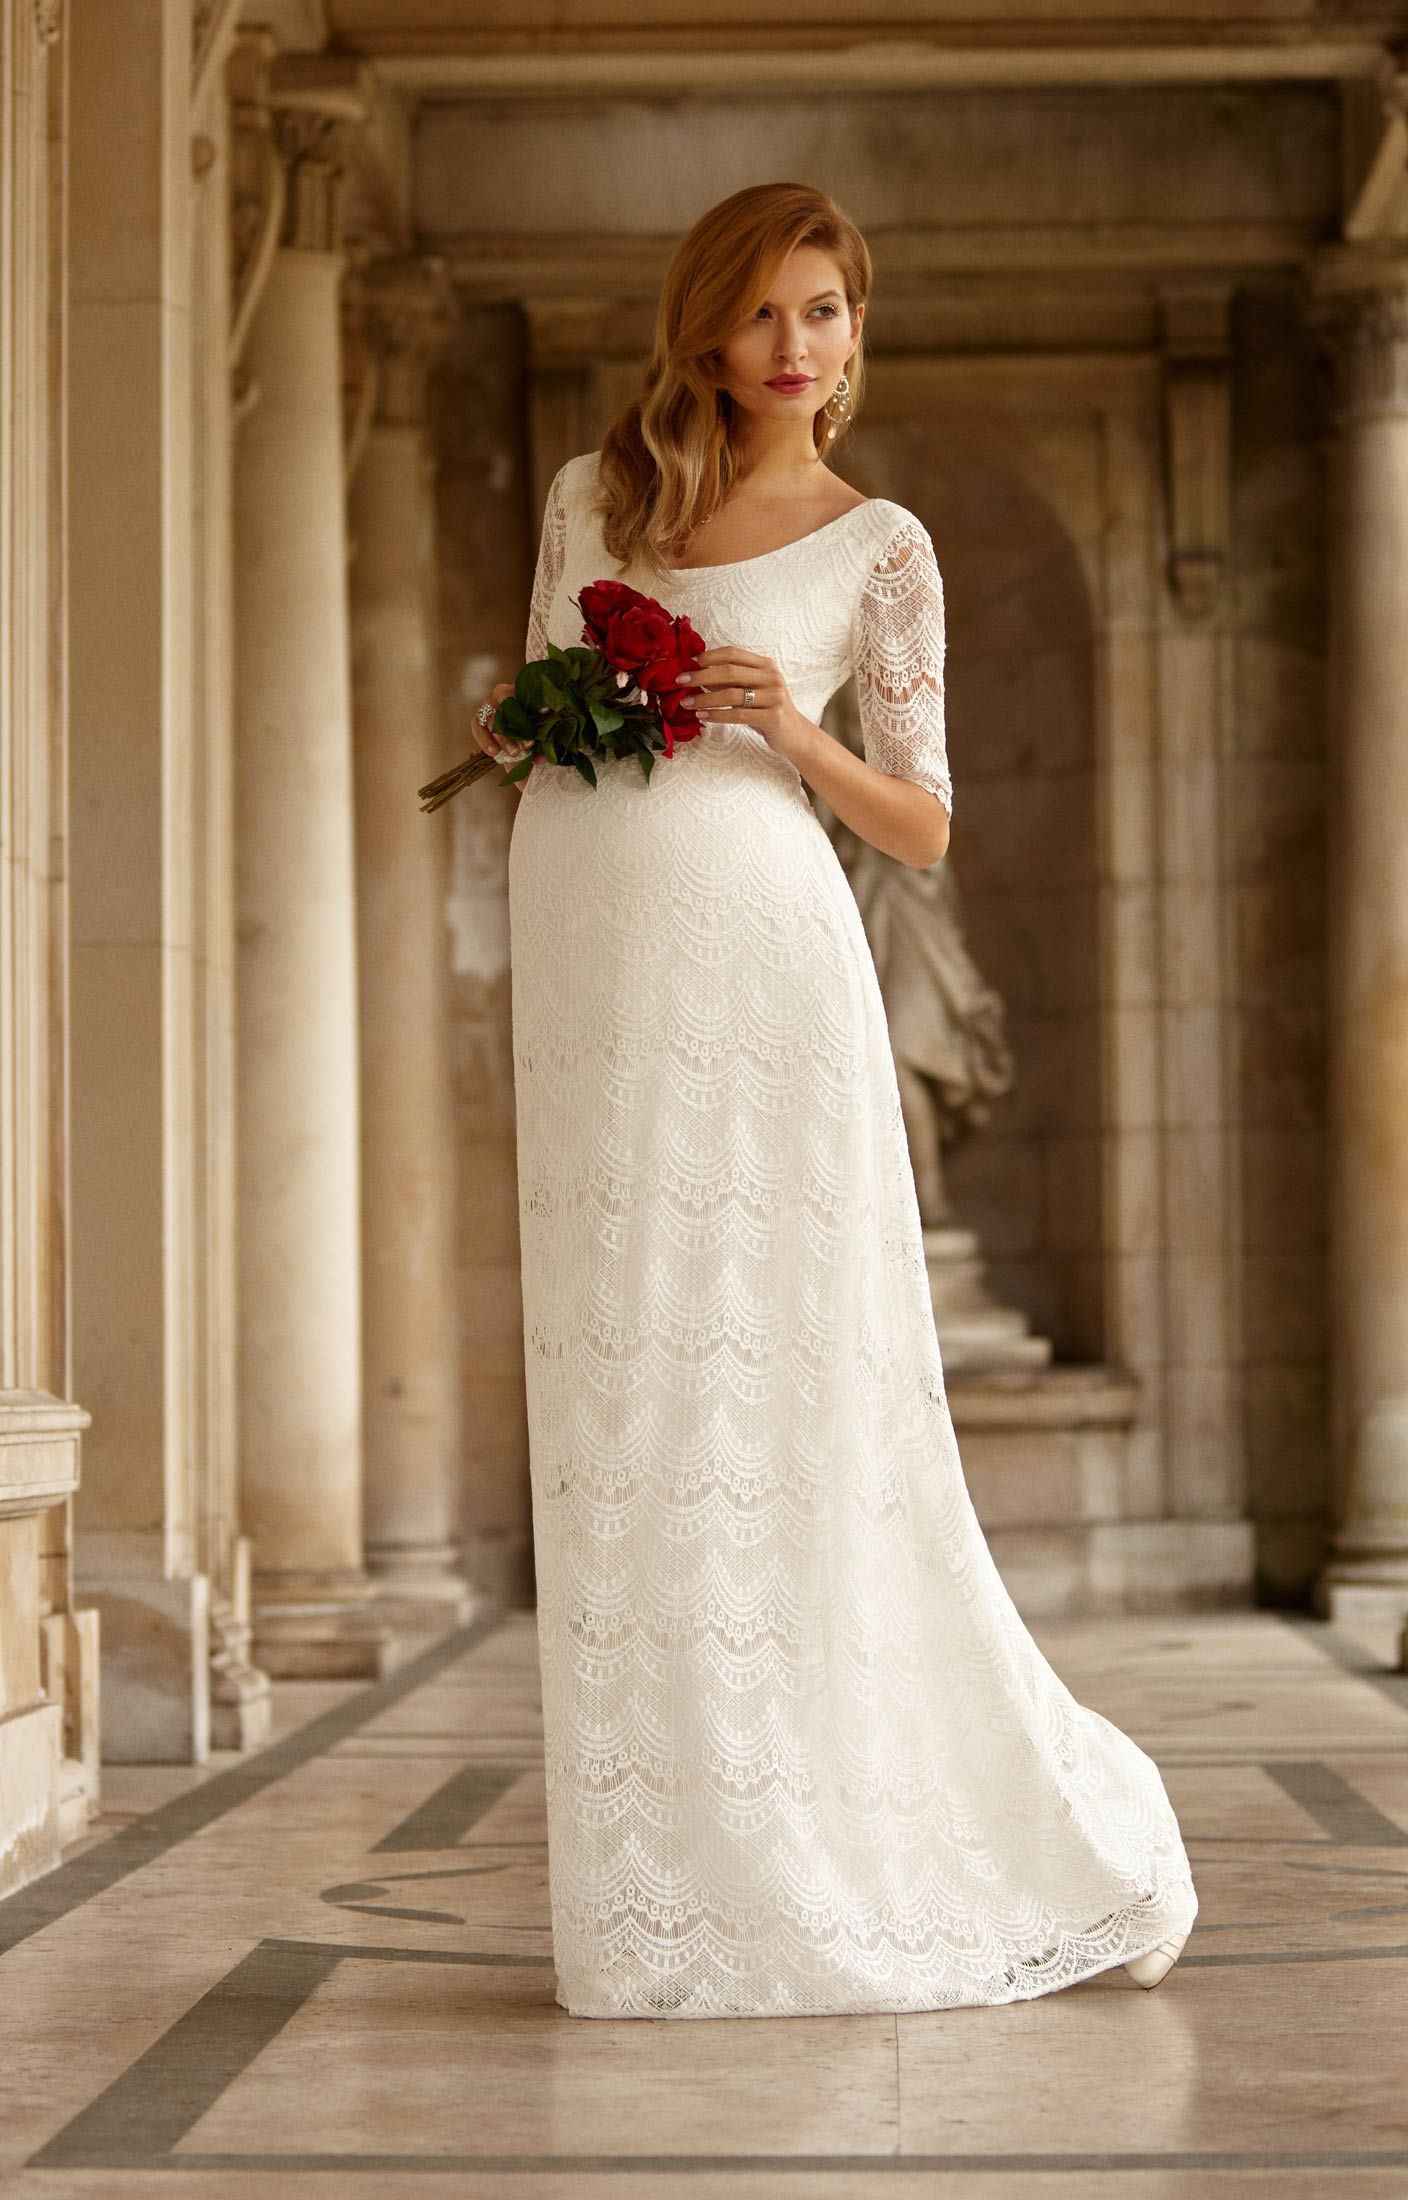 Verona Gown Henny Ilene Wedding Dresses Pregnant Wedding